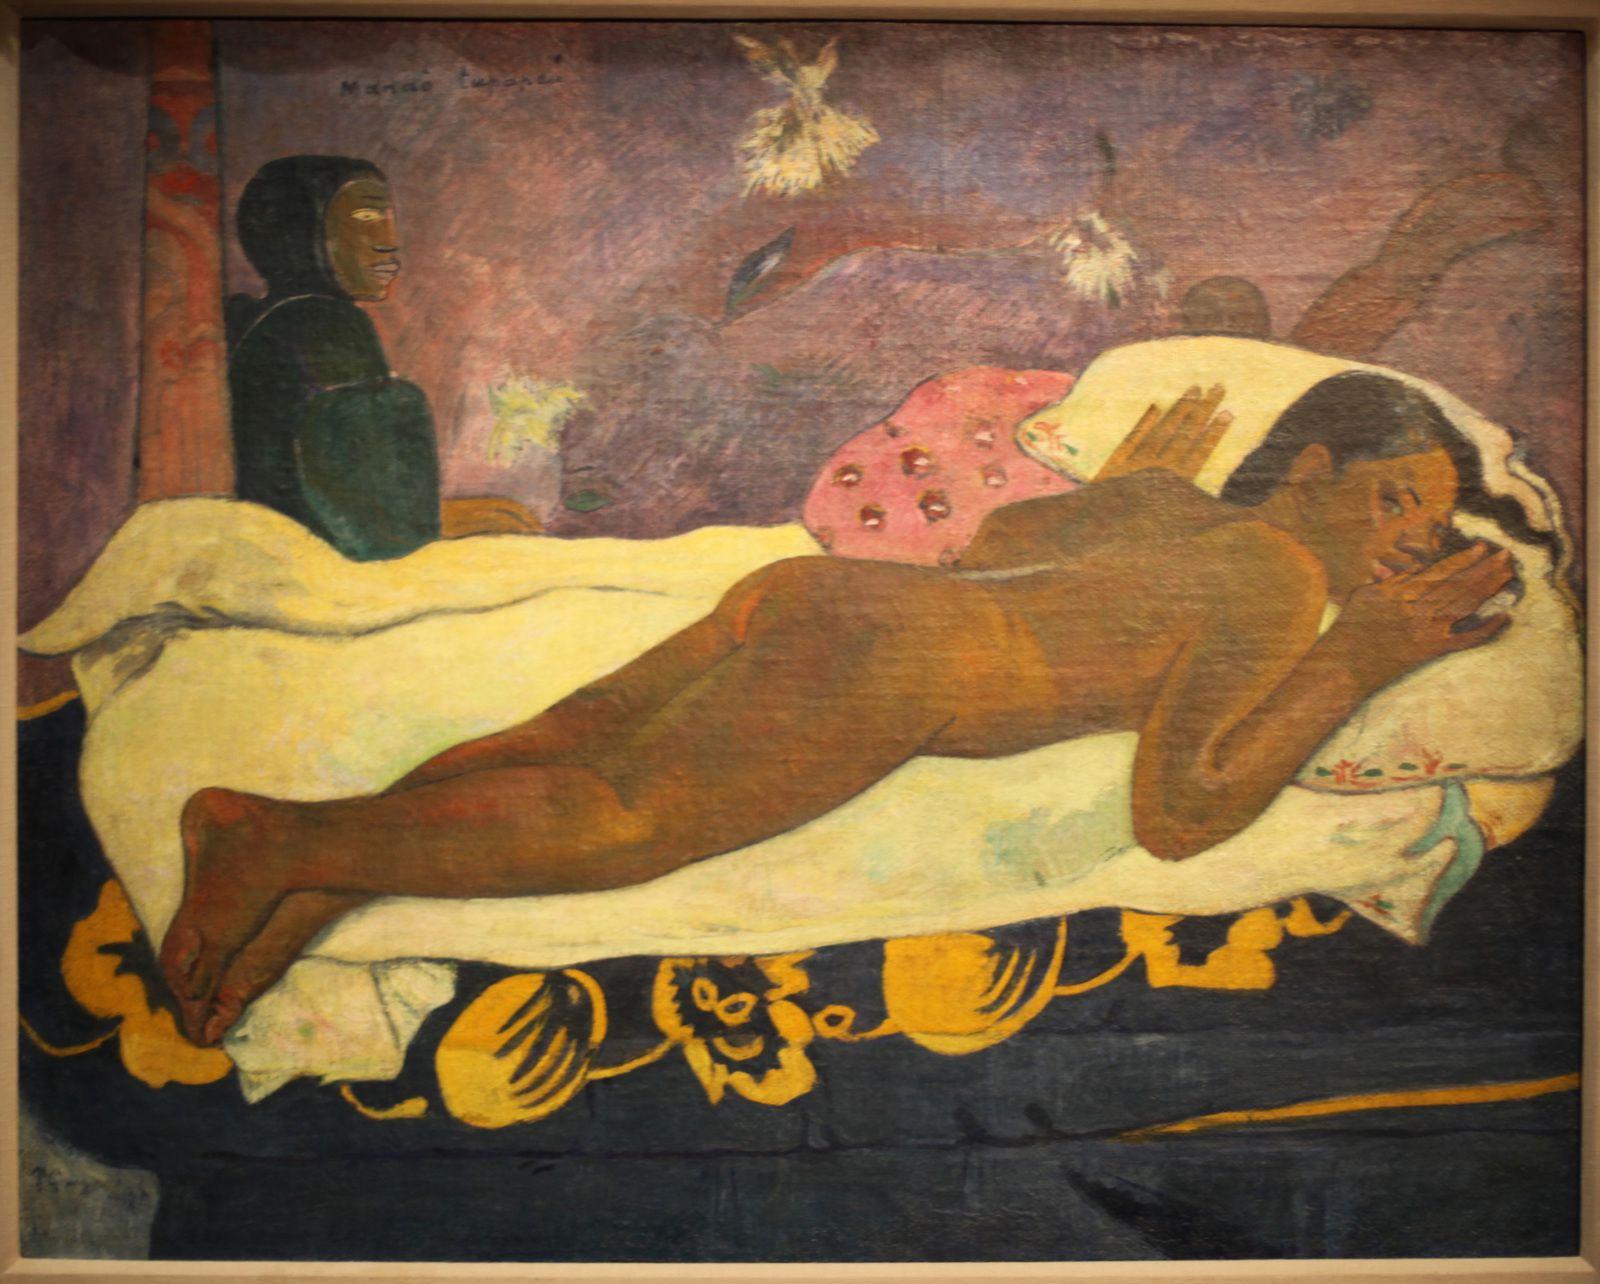 """MANAO TUPAPAU (L'esprit veille)"", 1892 de Paul GAUGUIN - Courtesy BUFFALO, Collection Albright-Knox Art Gallery  © Photo Éric Simon"